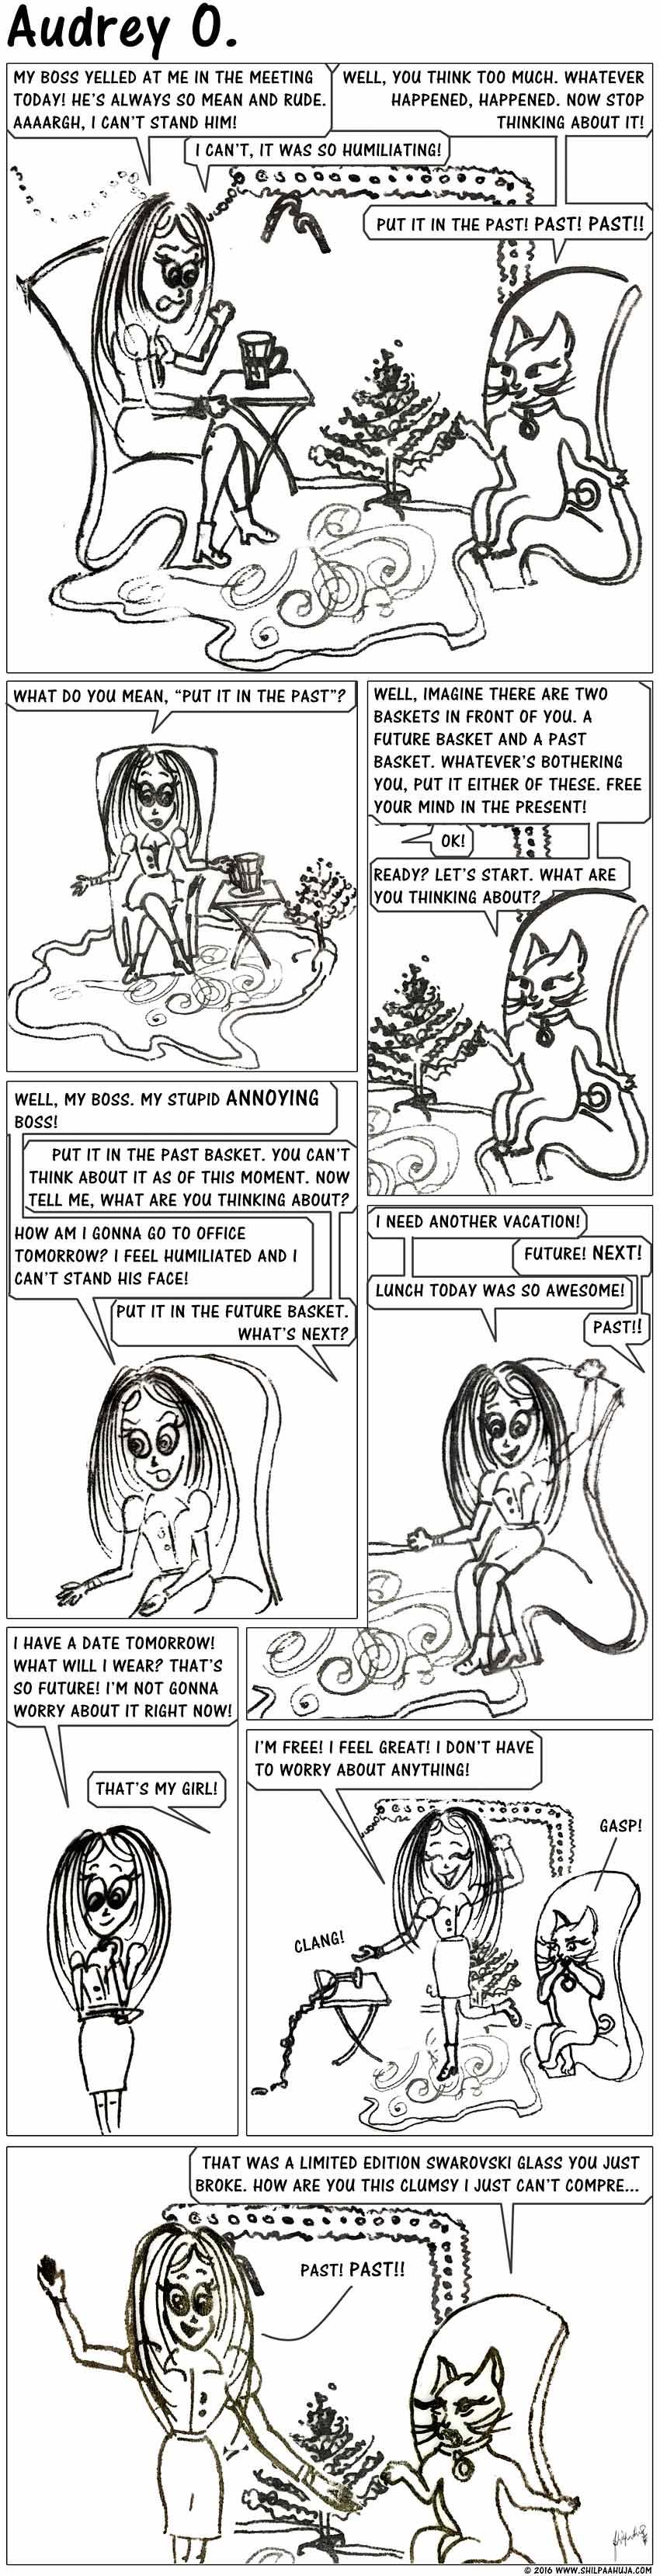 audrey-o-comic-v1e120-cartoon-how-to-not-think-too-much-calm-past-future-coco